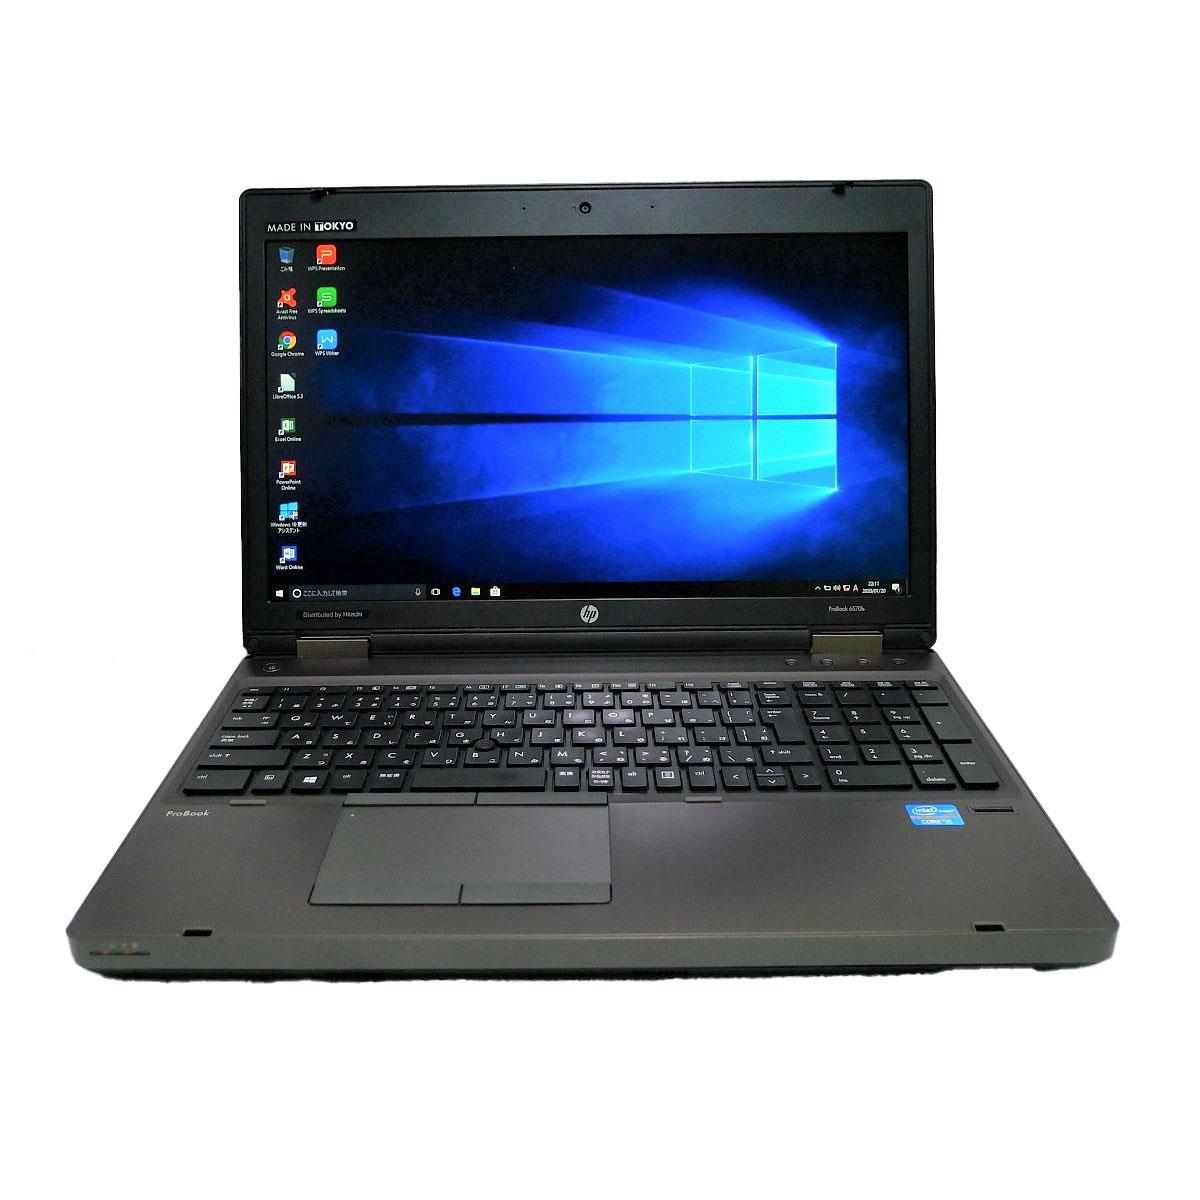 HP ProBook 6560bCeleron 16GB 新品HDD1TB 祝開店大放出セール開催中 スーパーマルチ HD+ ノートパソコン 64bitWPSOffice 15.6インチ Windows10 中古 無線LAN 中古パソコン バースデー 記念日 ギフト 贈物 お勧め 通販